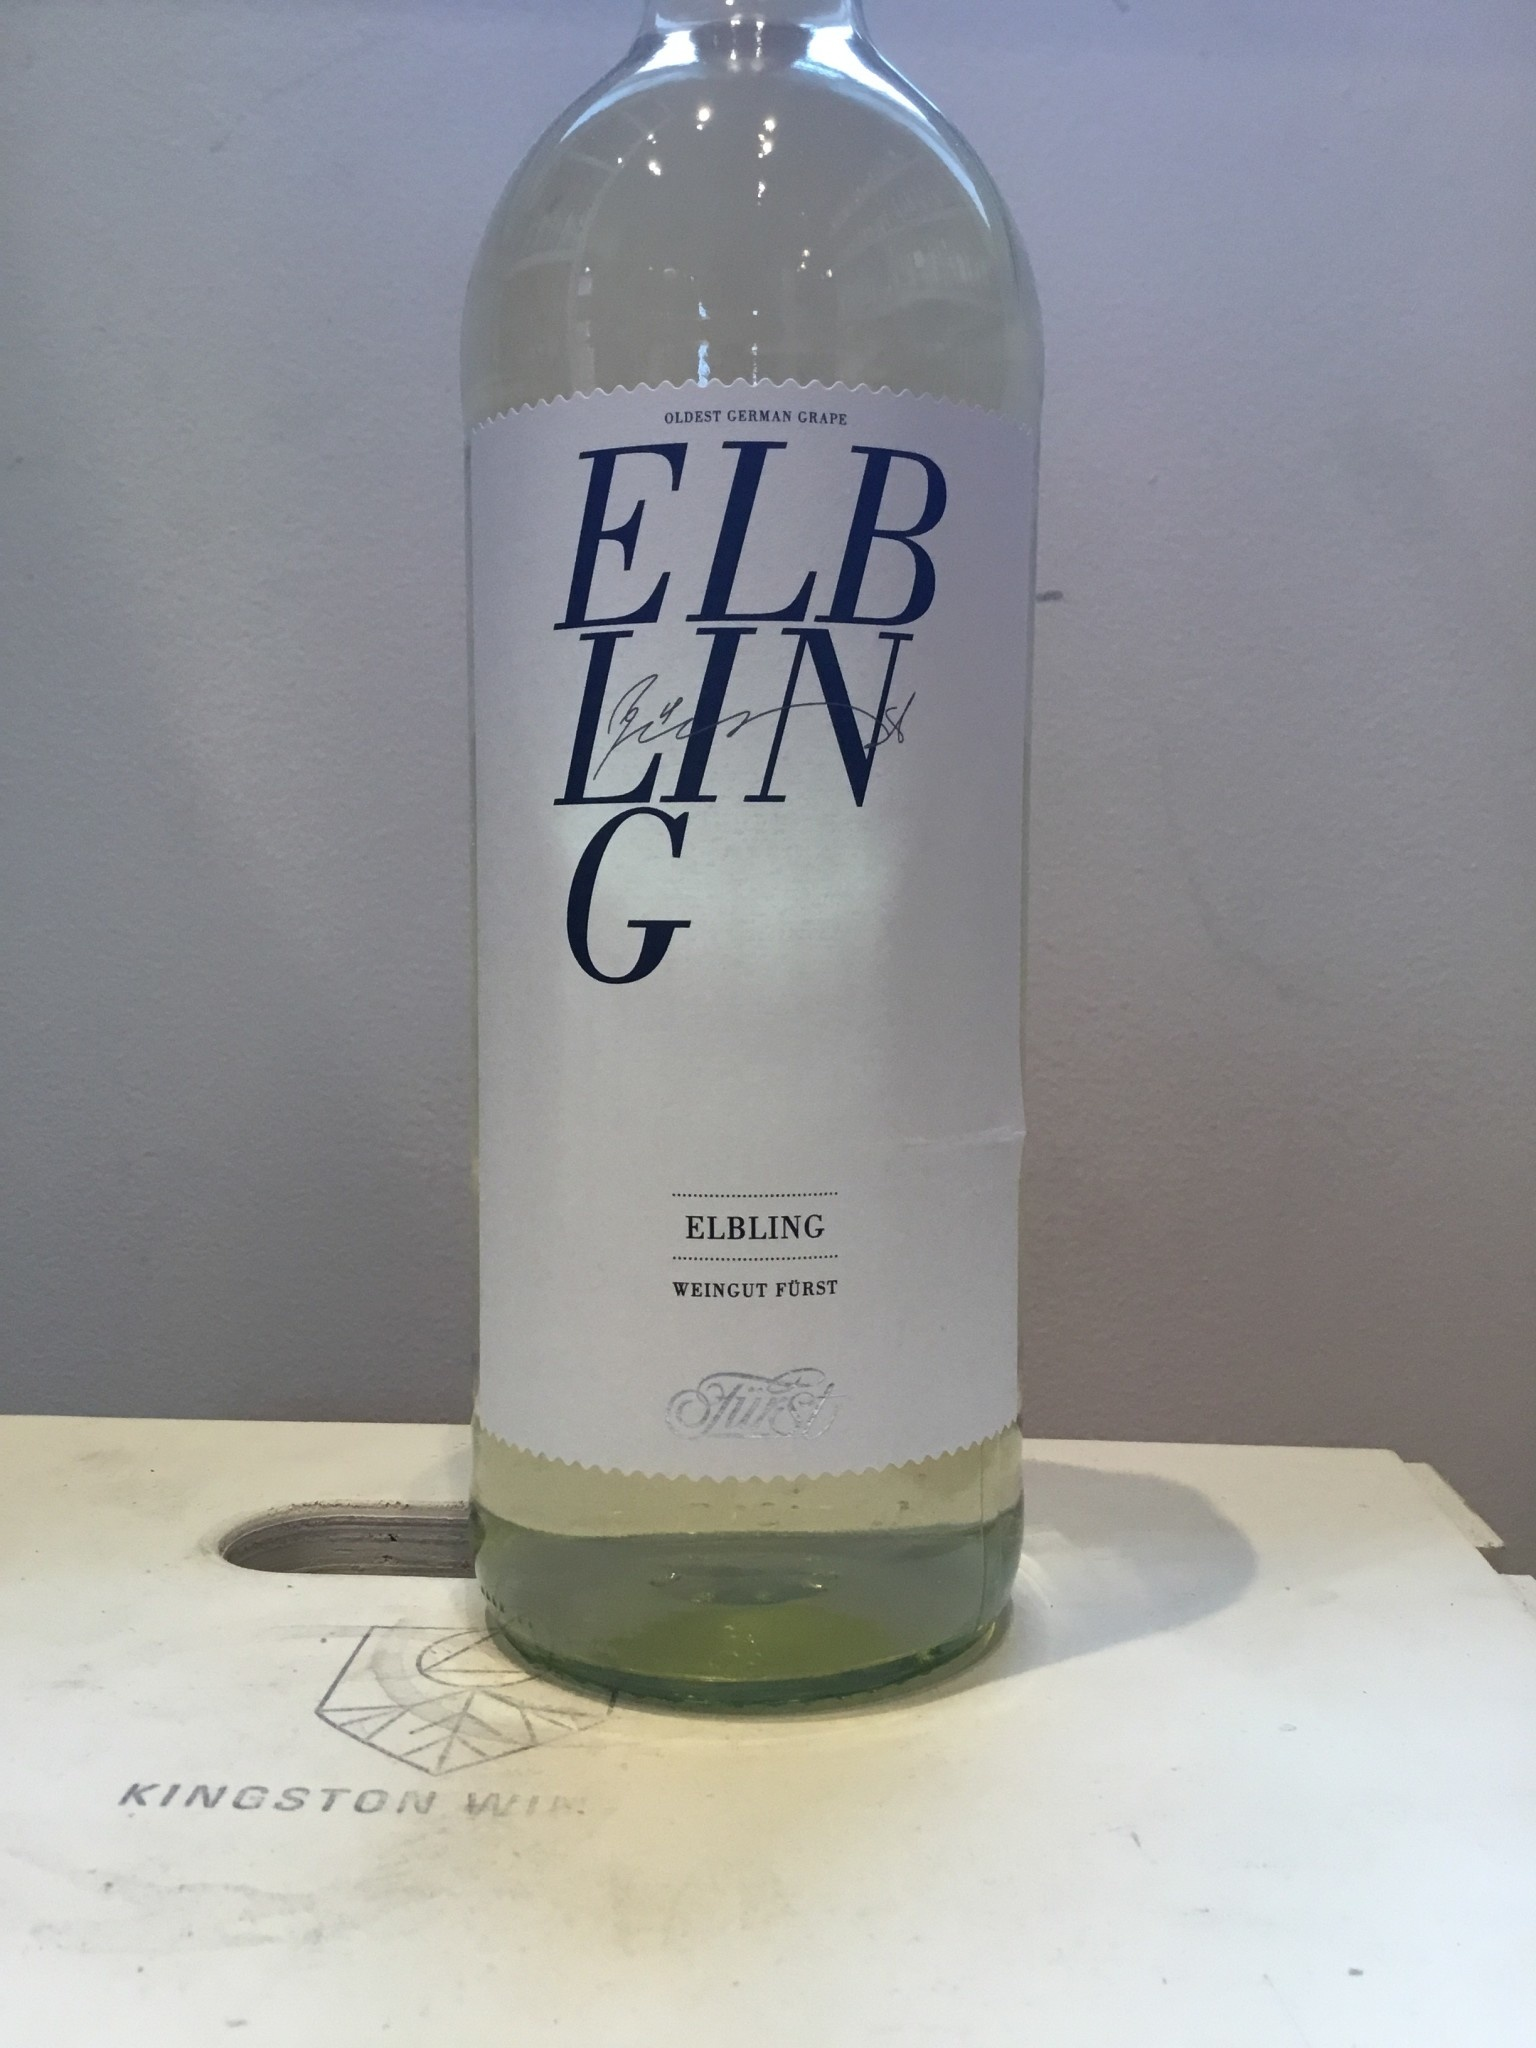 2017 Weingut Furst Elbling, 1 Liter